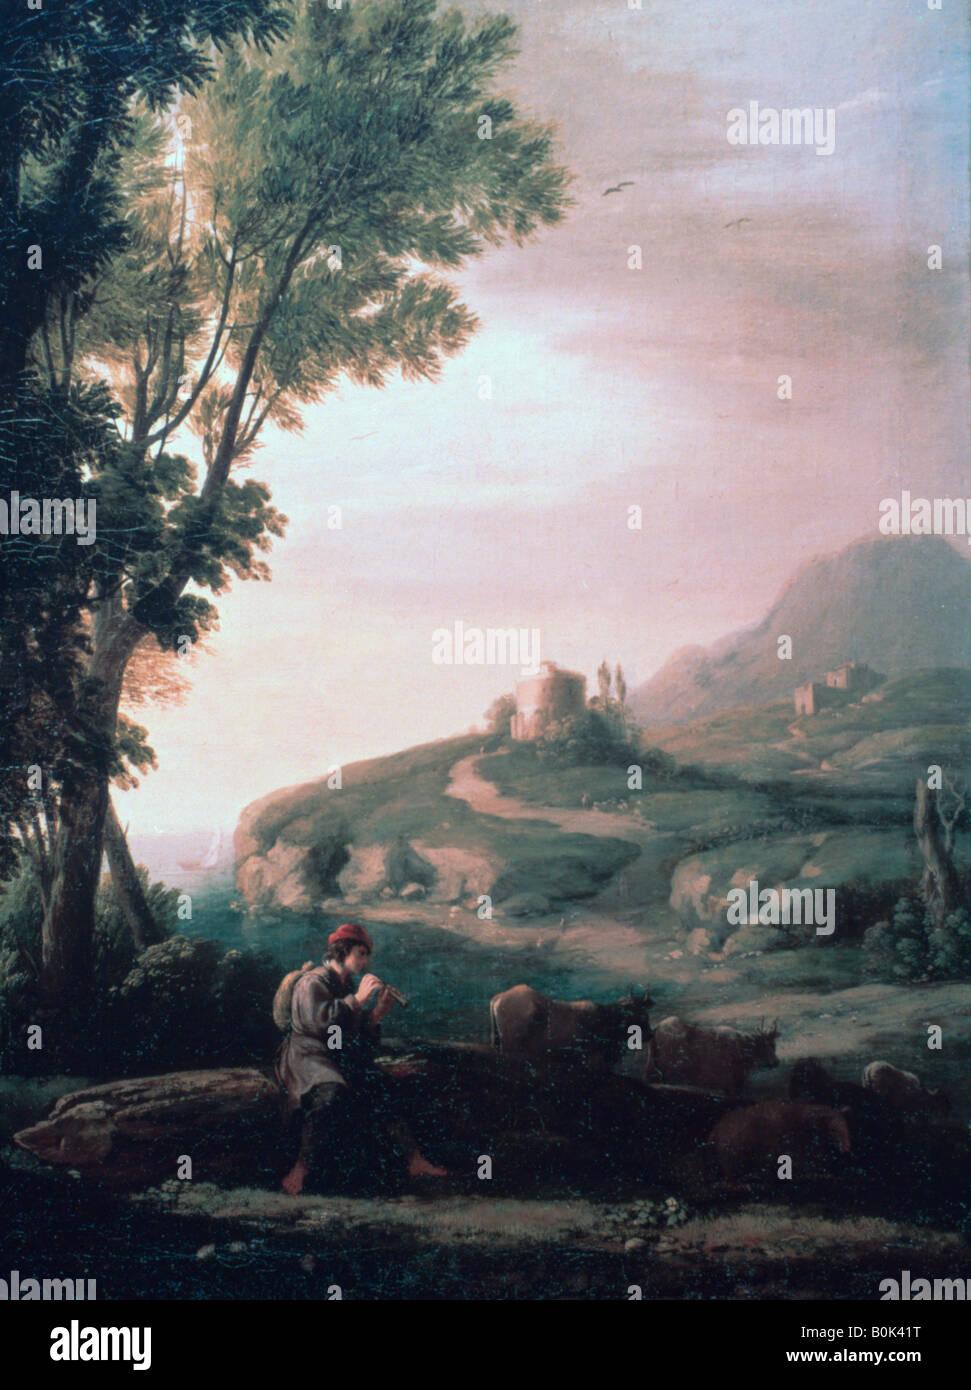 'Pastoral Landscape', c1620-1682. Artist: Claude Lorrain - Stock Image